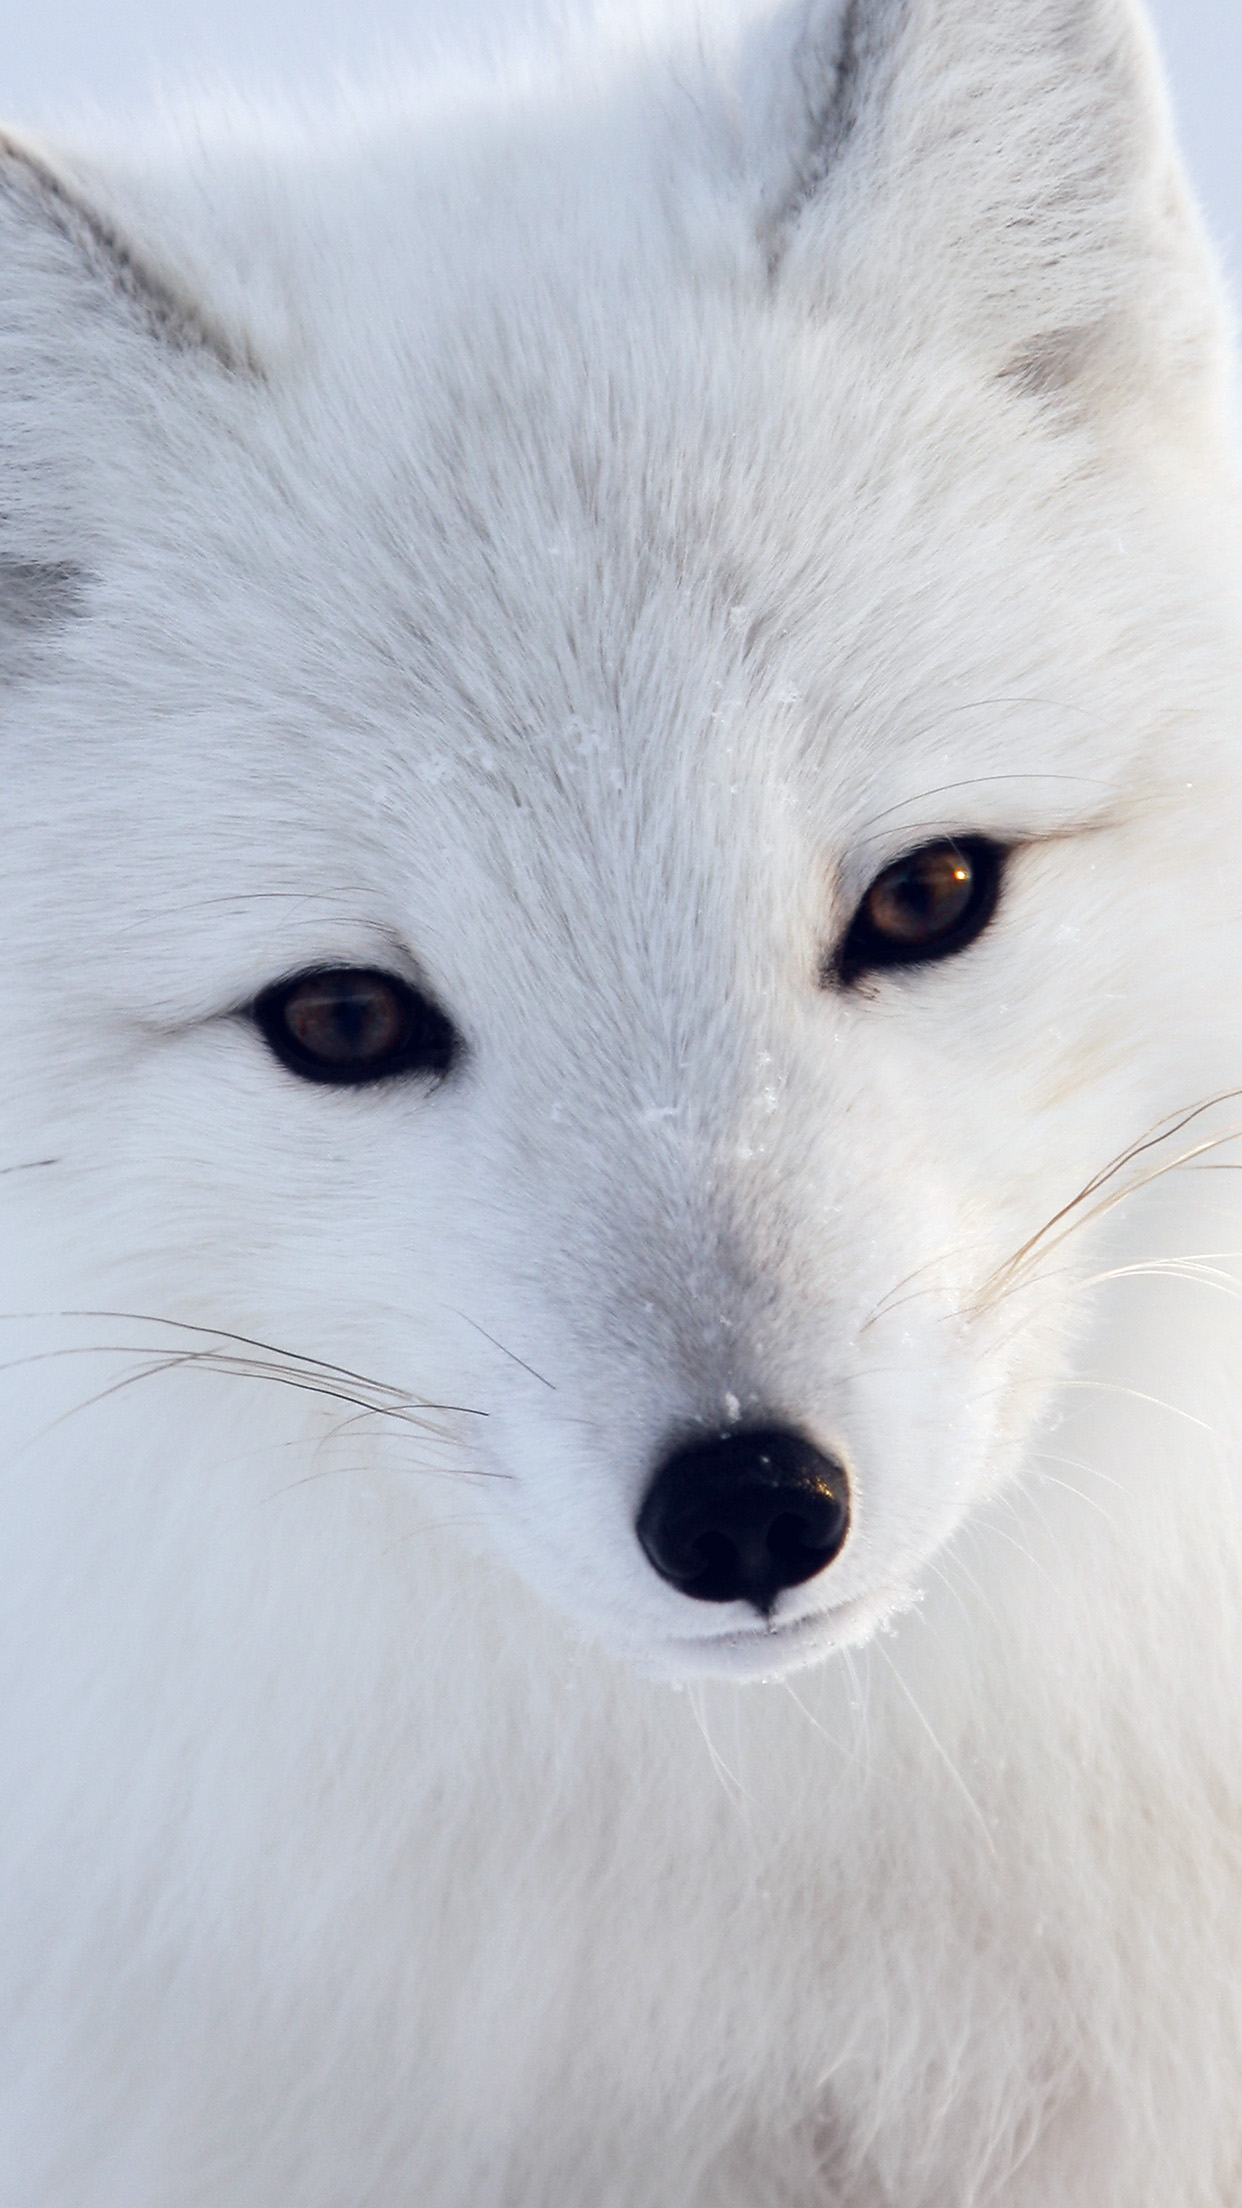 Iphone6papers Mu16 Artic Fox White Animal Cute